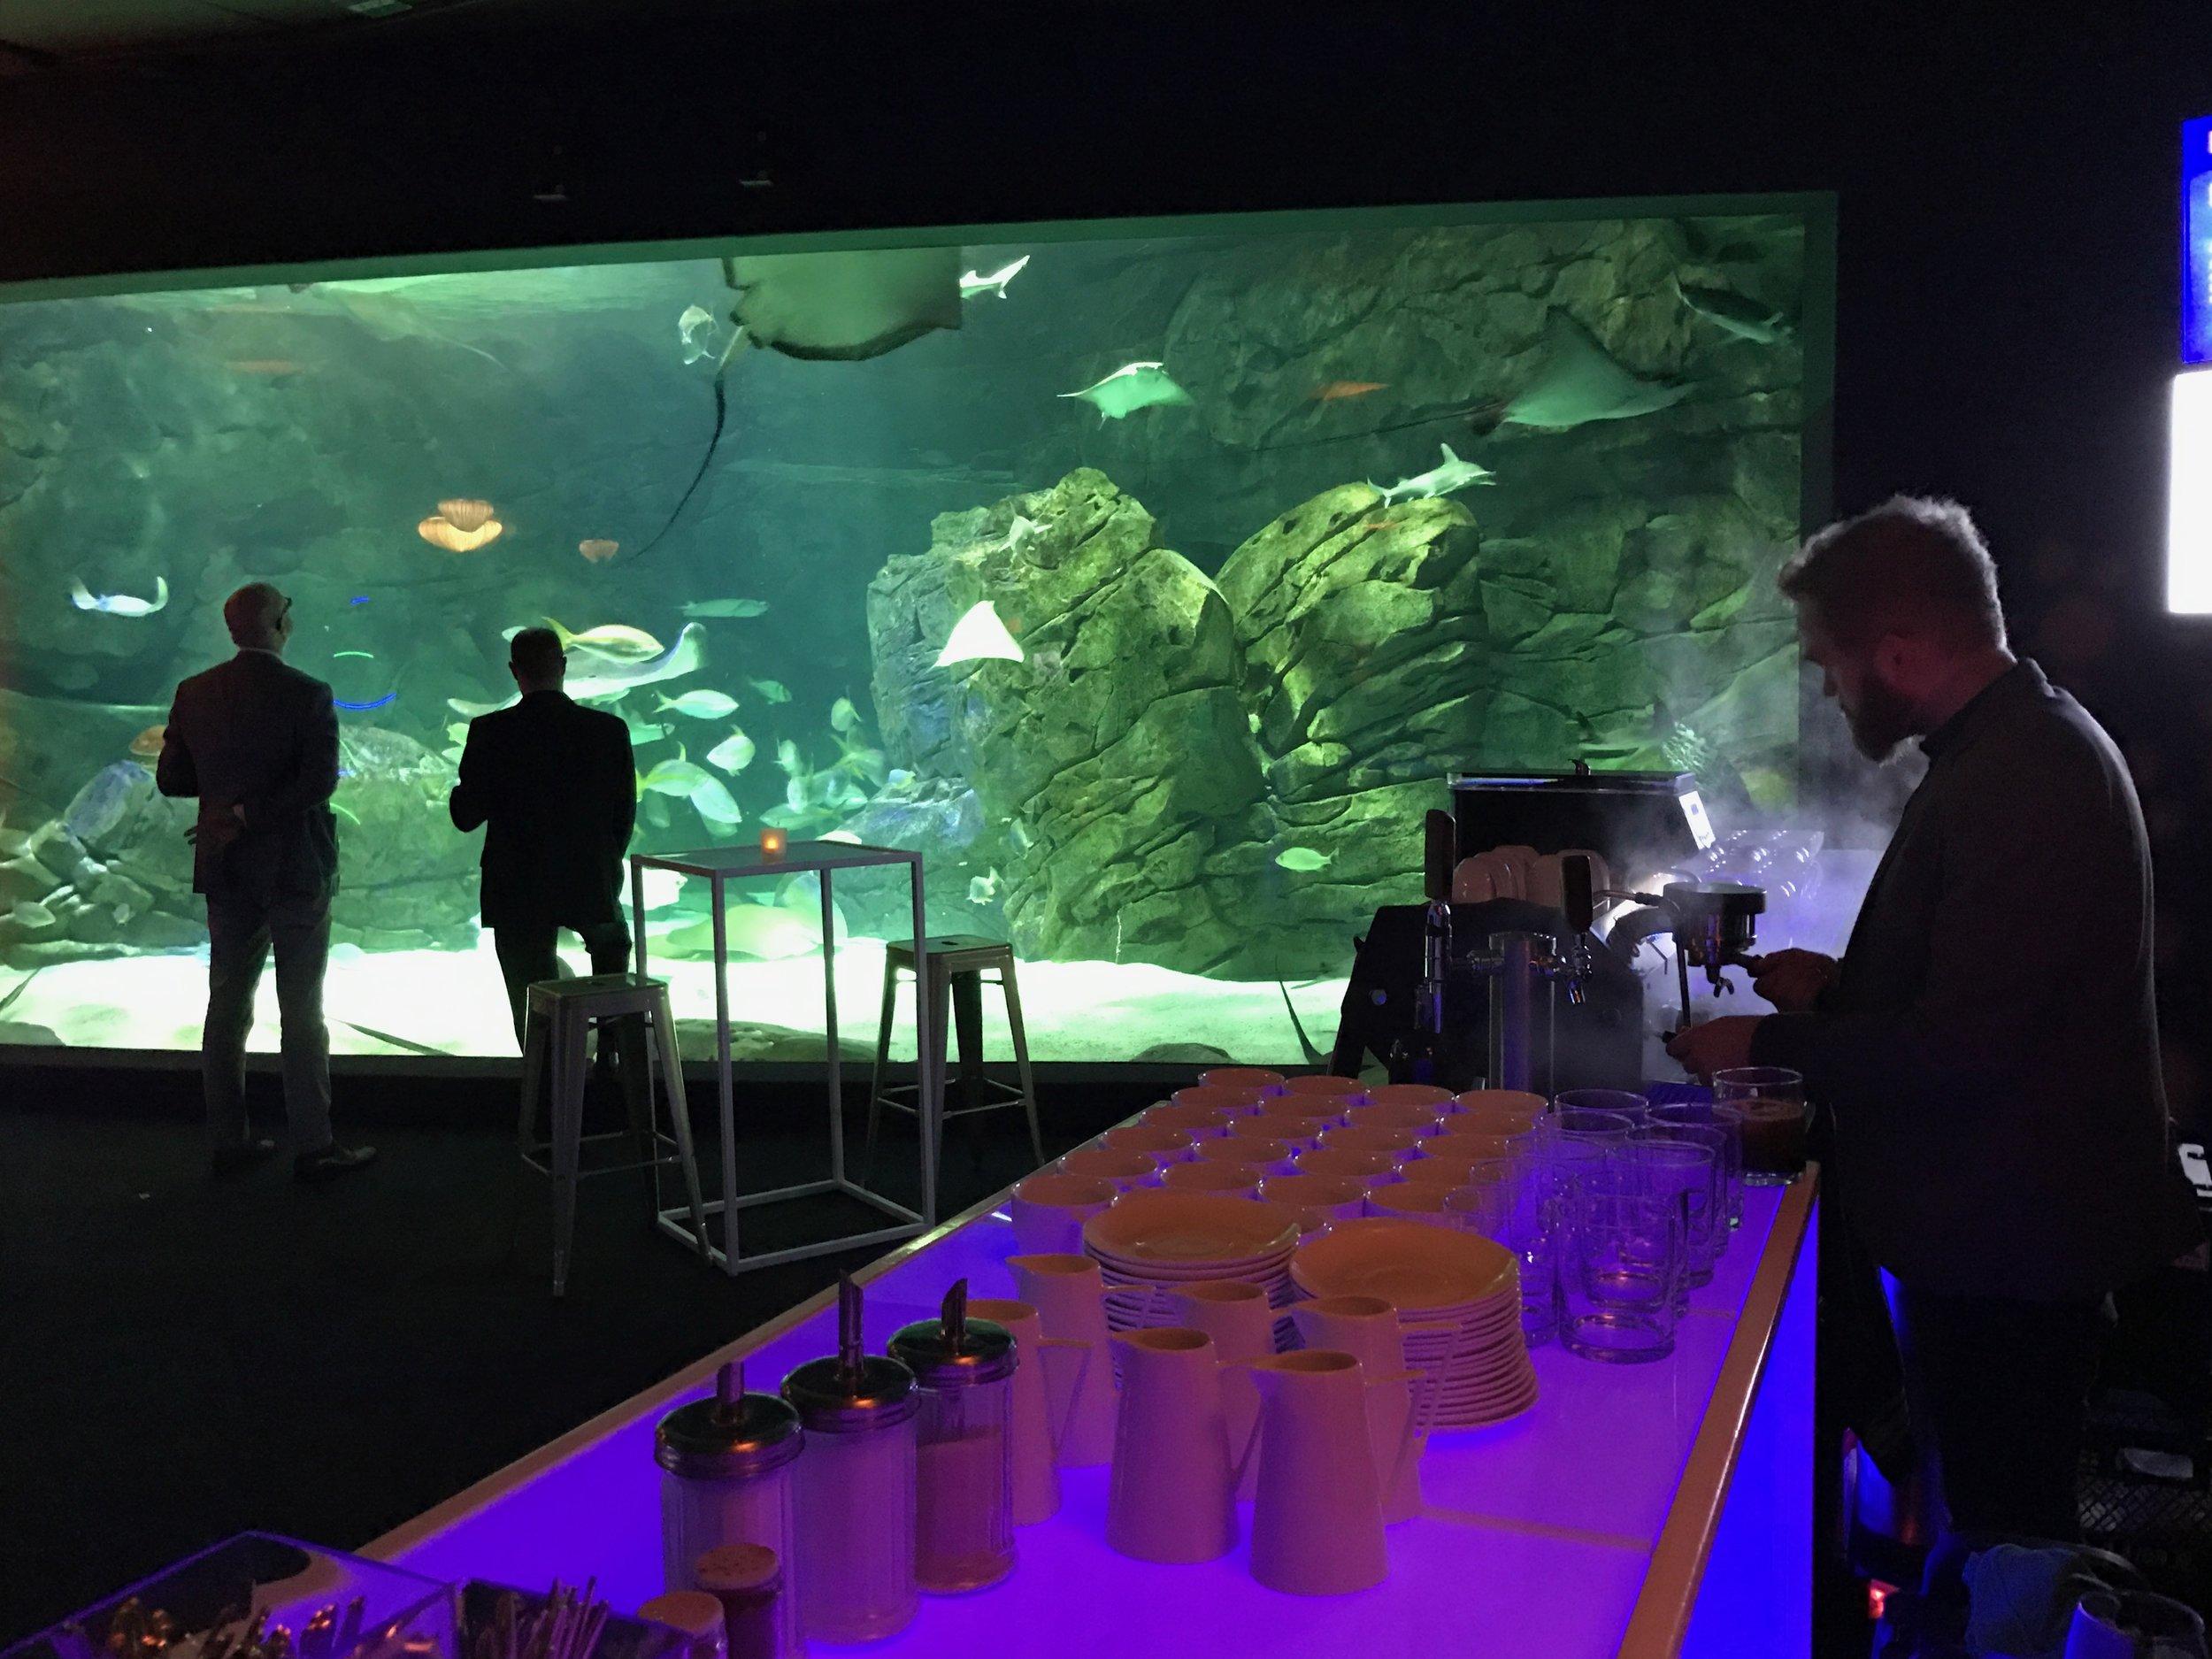 Ripley's Aquarium Event